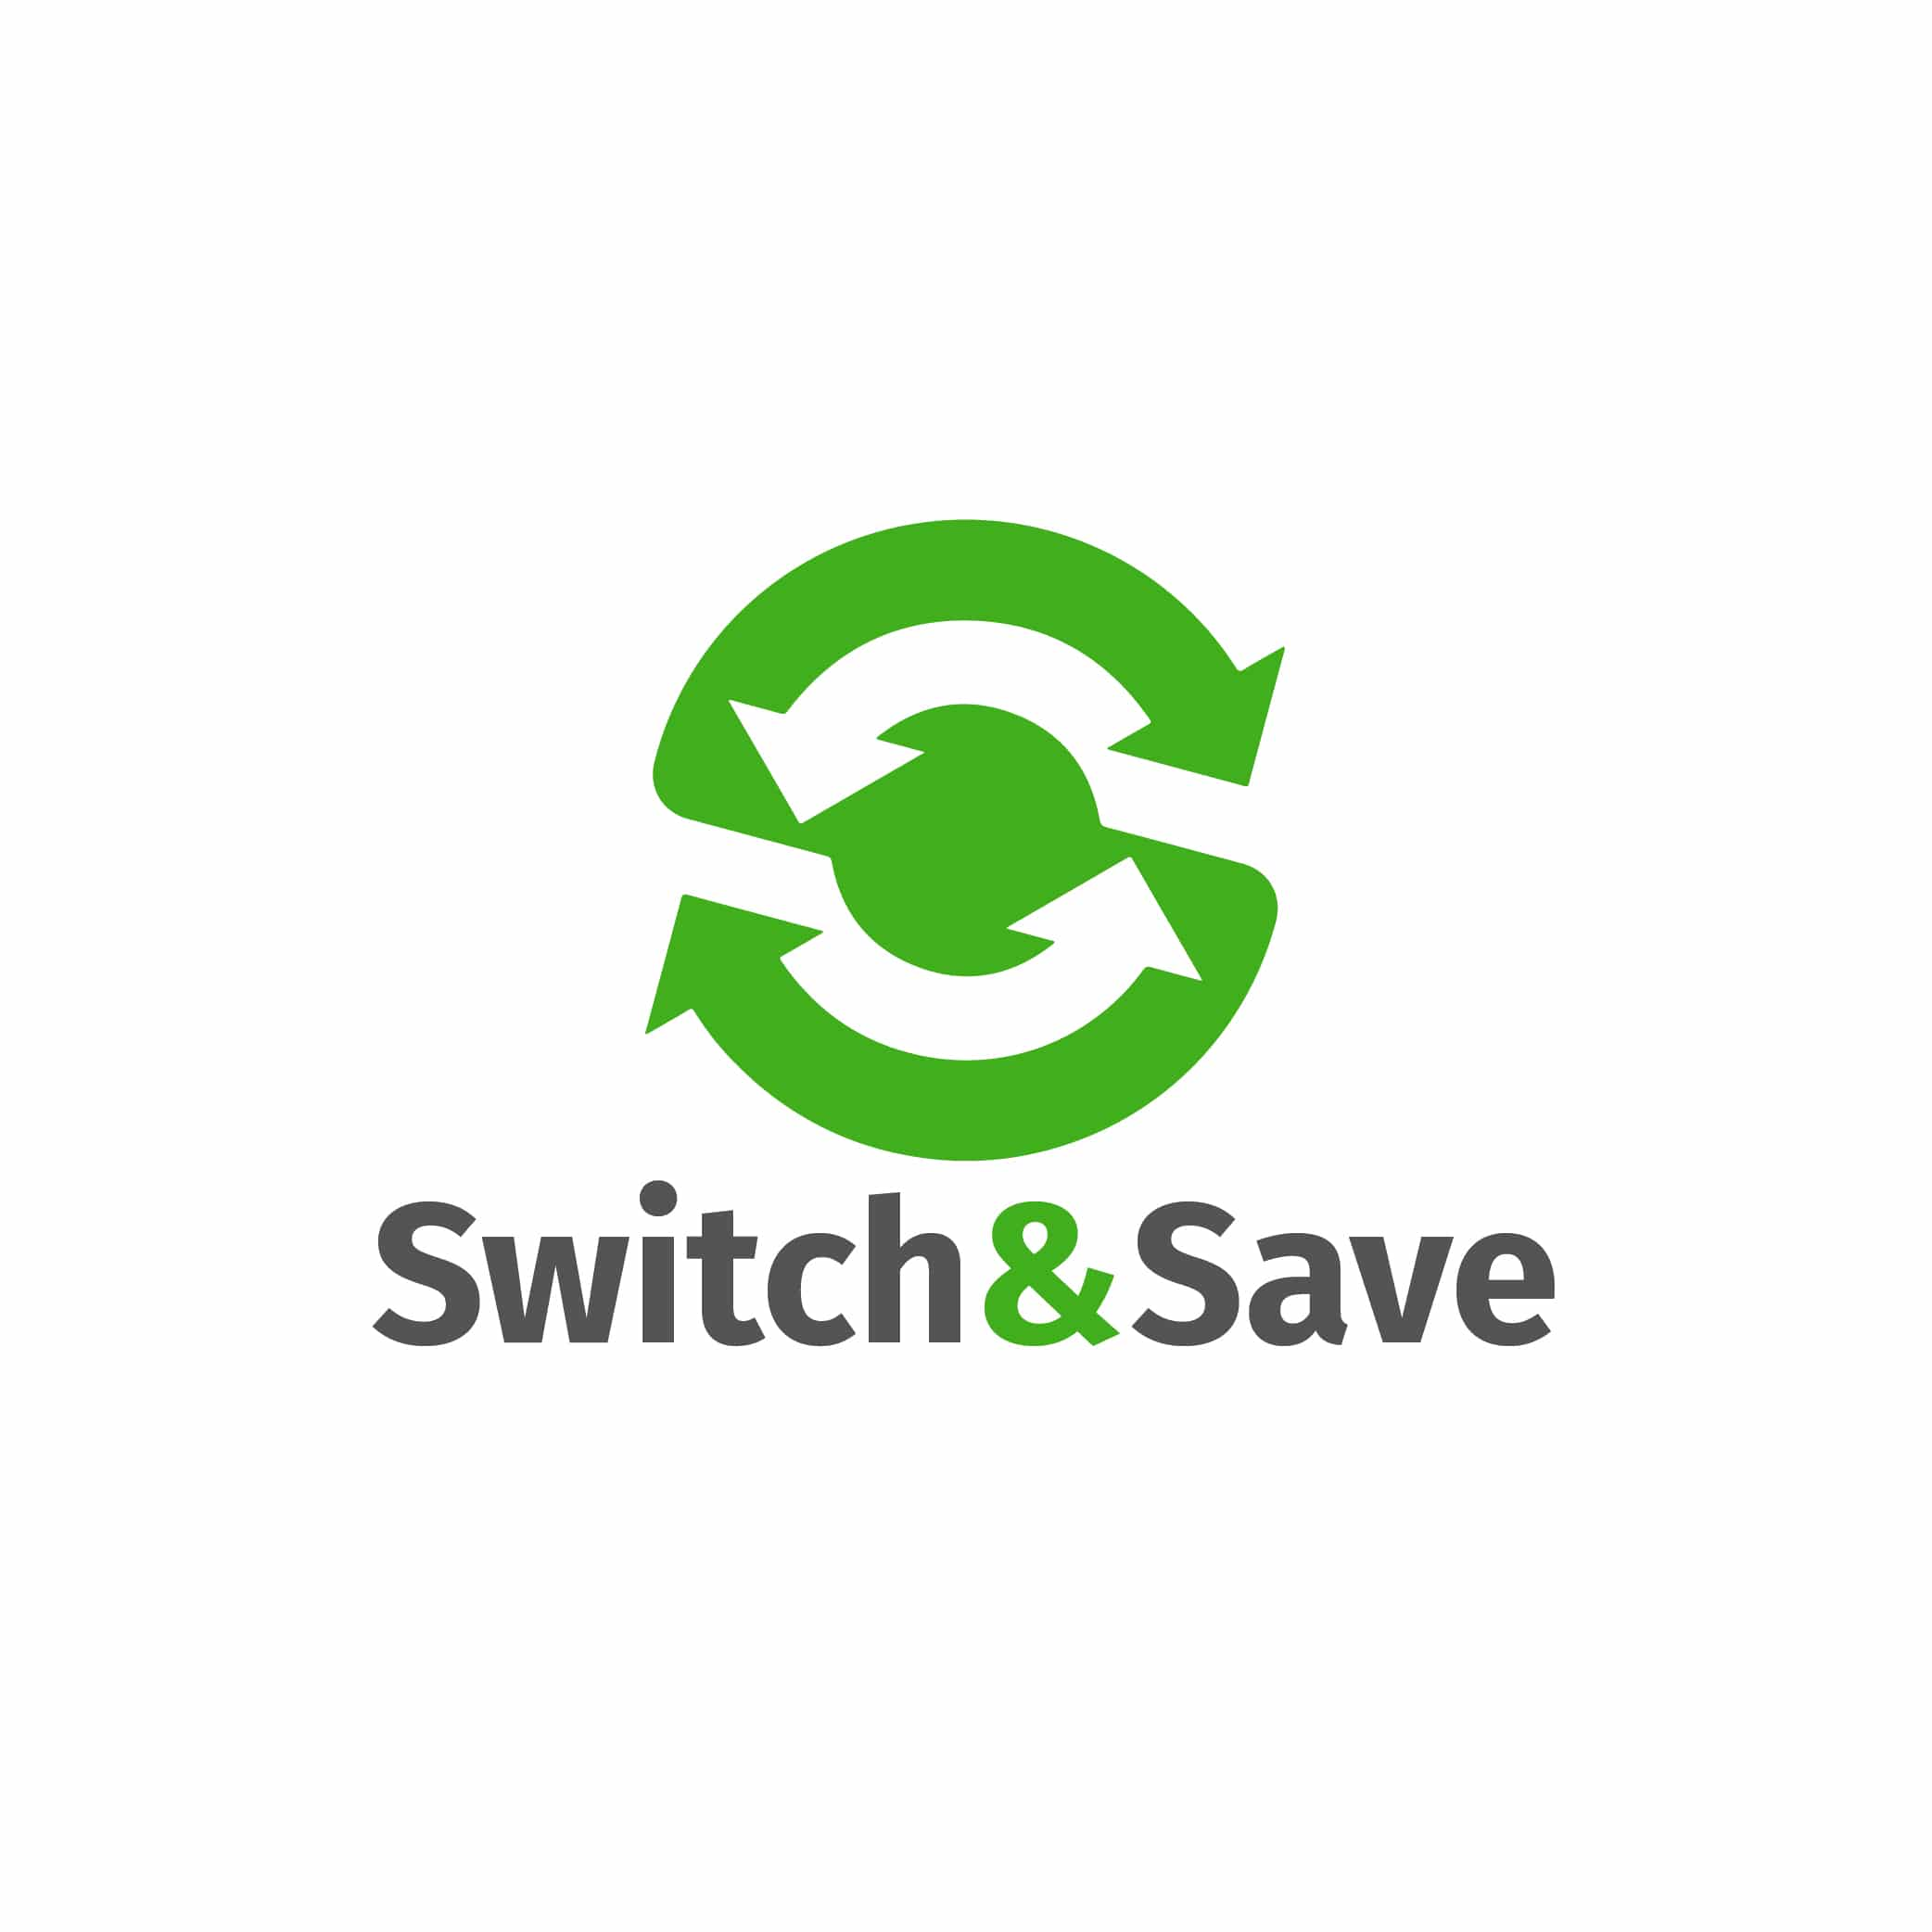 switchsaveenergylogodesignartboard 1 weardigital